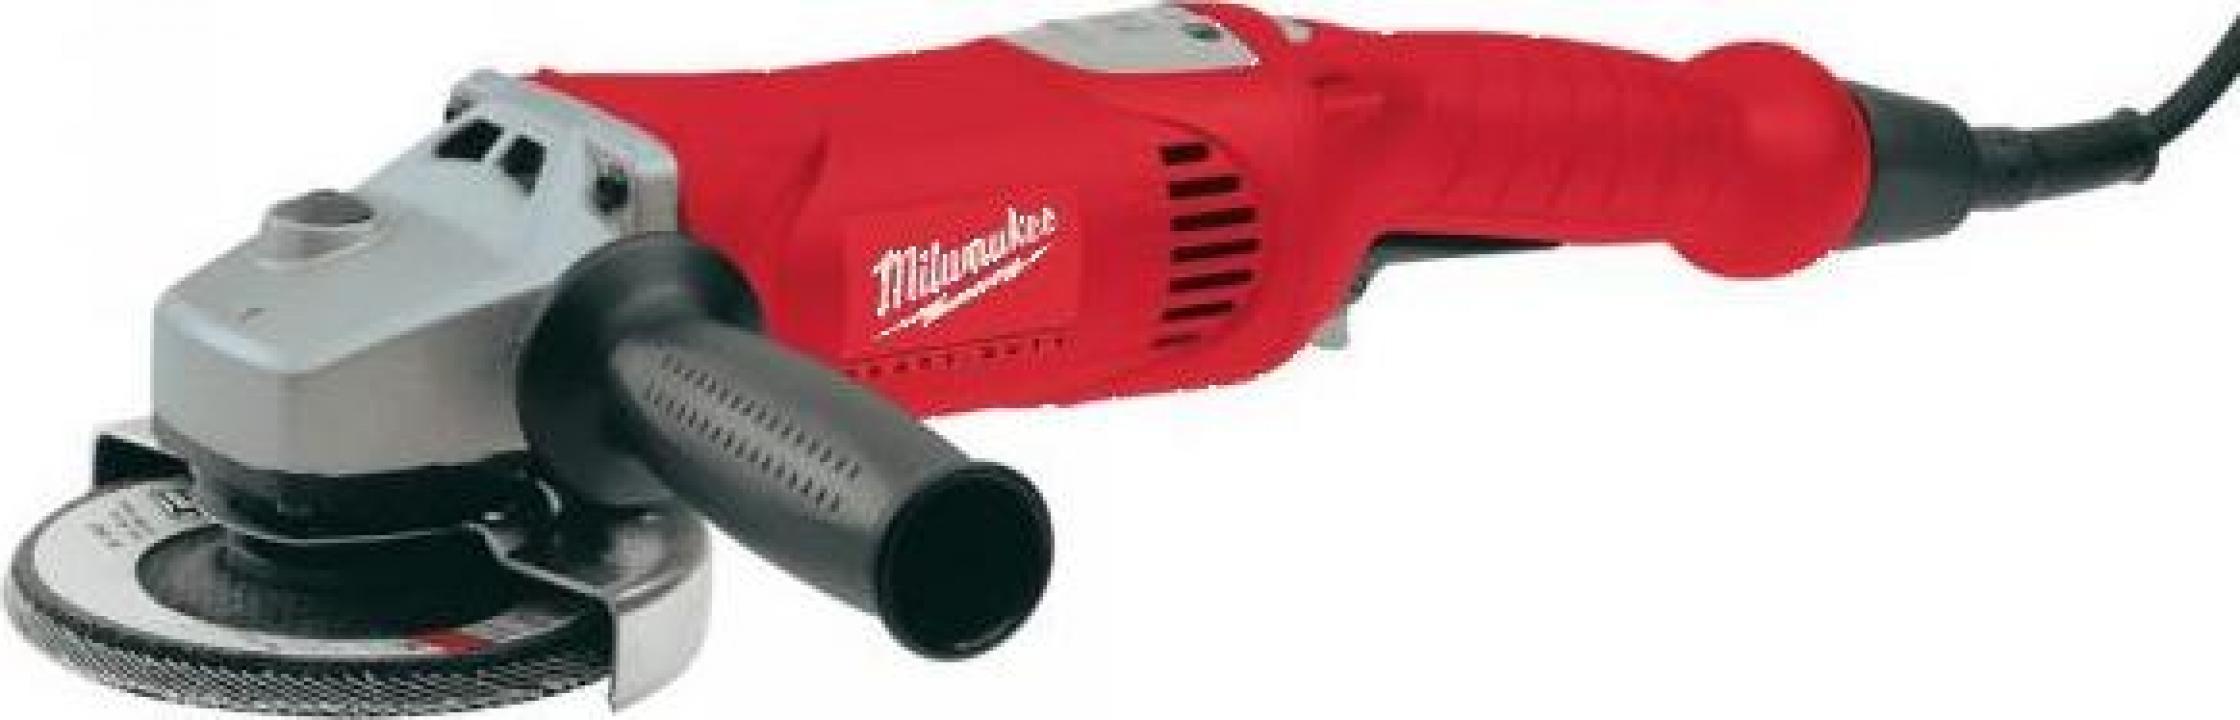 Polizor unghiular Milwaukee AG 16-125 inox, 1520 W, 125 mm